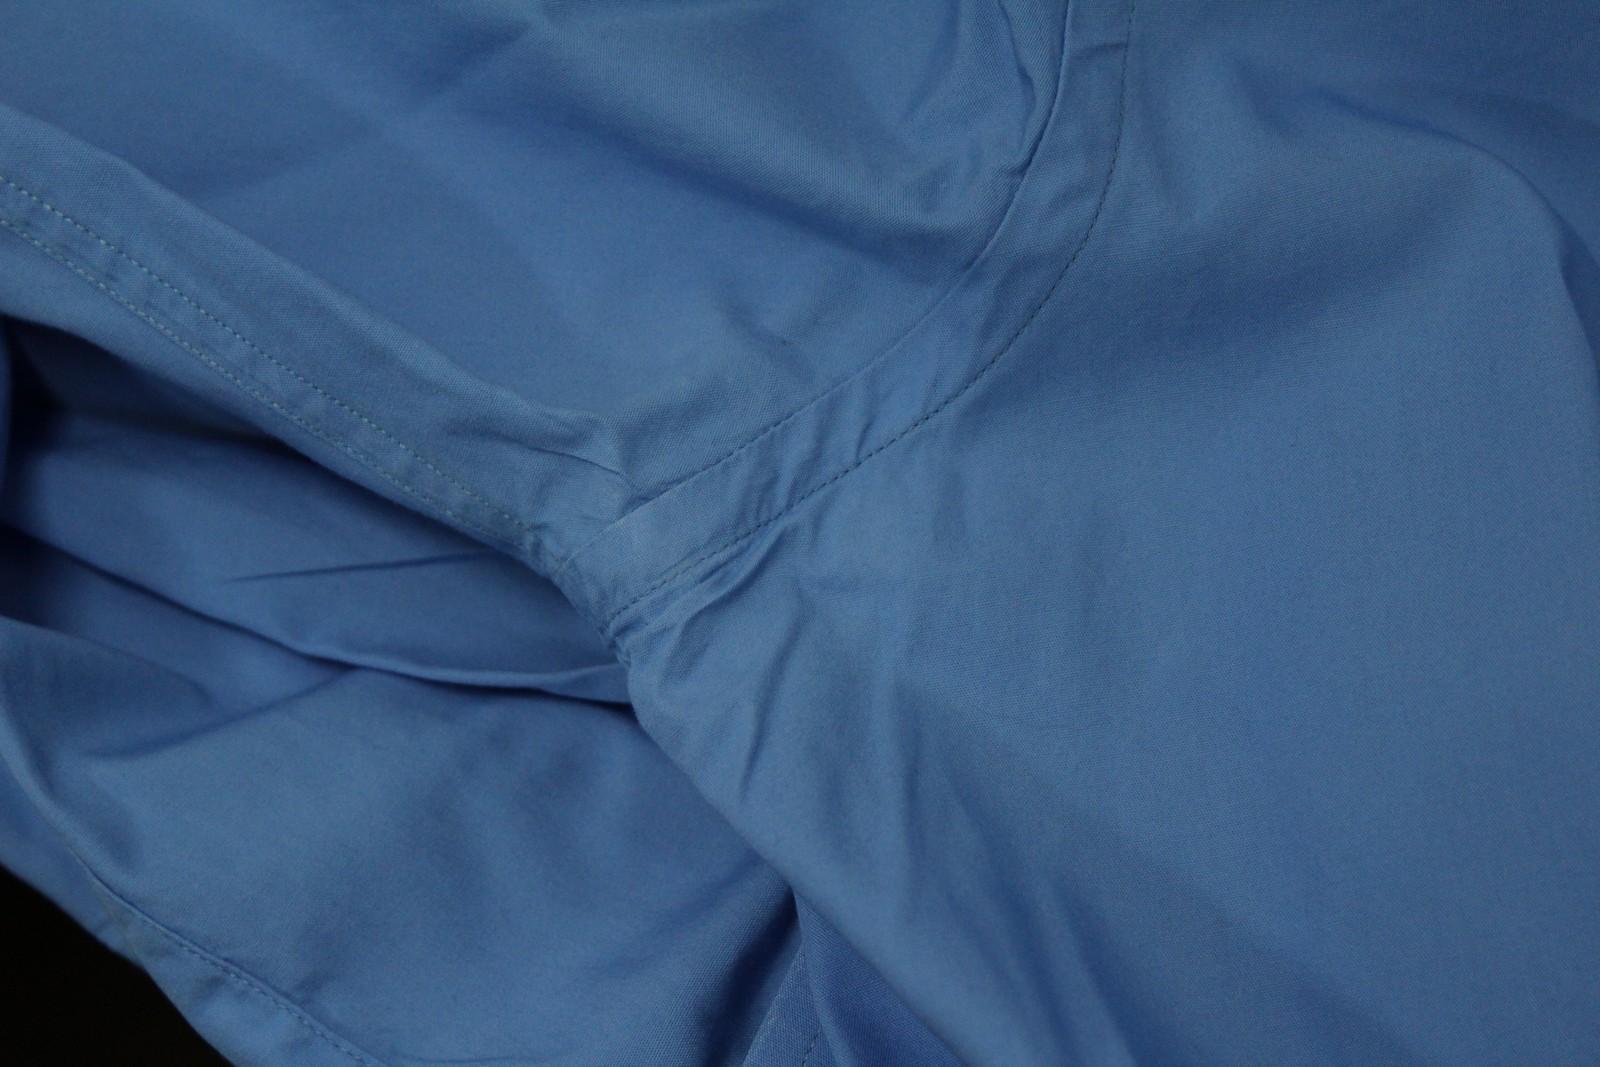 Paul-Smith-Hombres-Azul-Algodon-Mangas-Largas-Camisa-De-Puno-Doble-Cuello-16-5-034-42cm miniatura 9